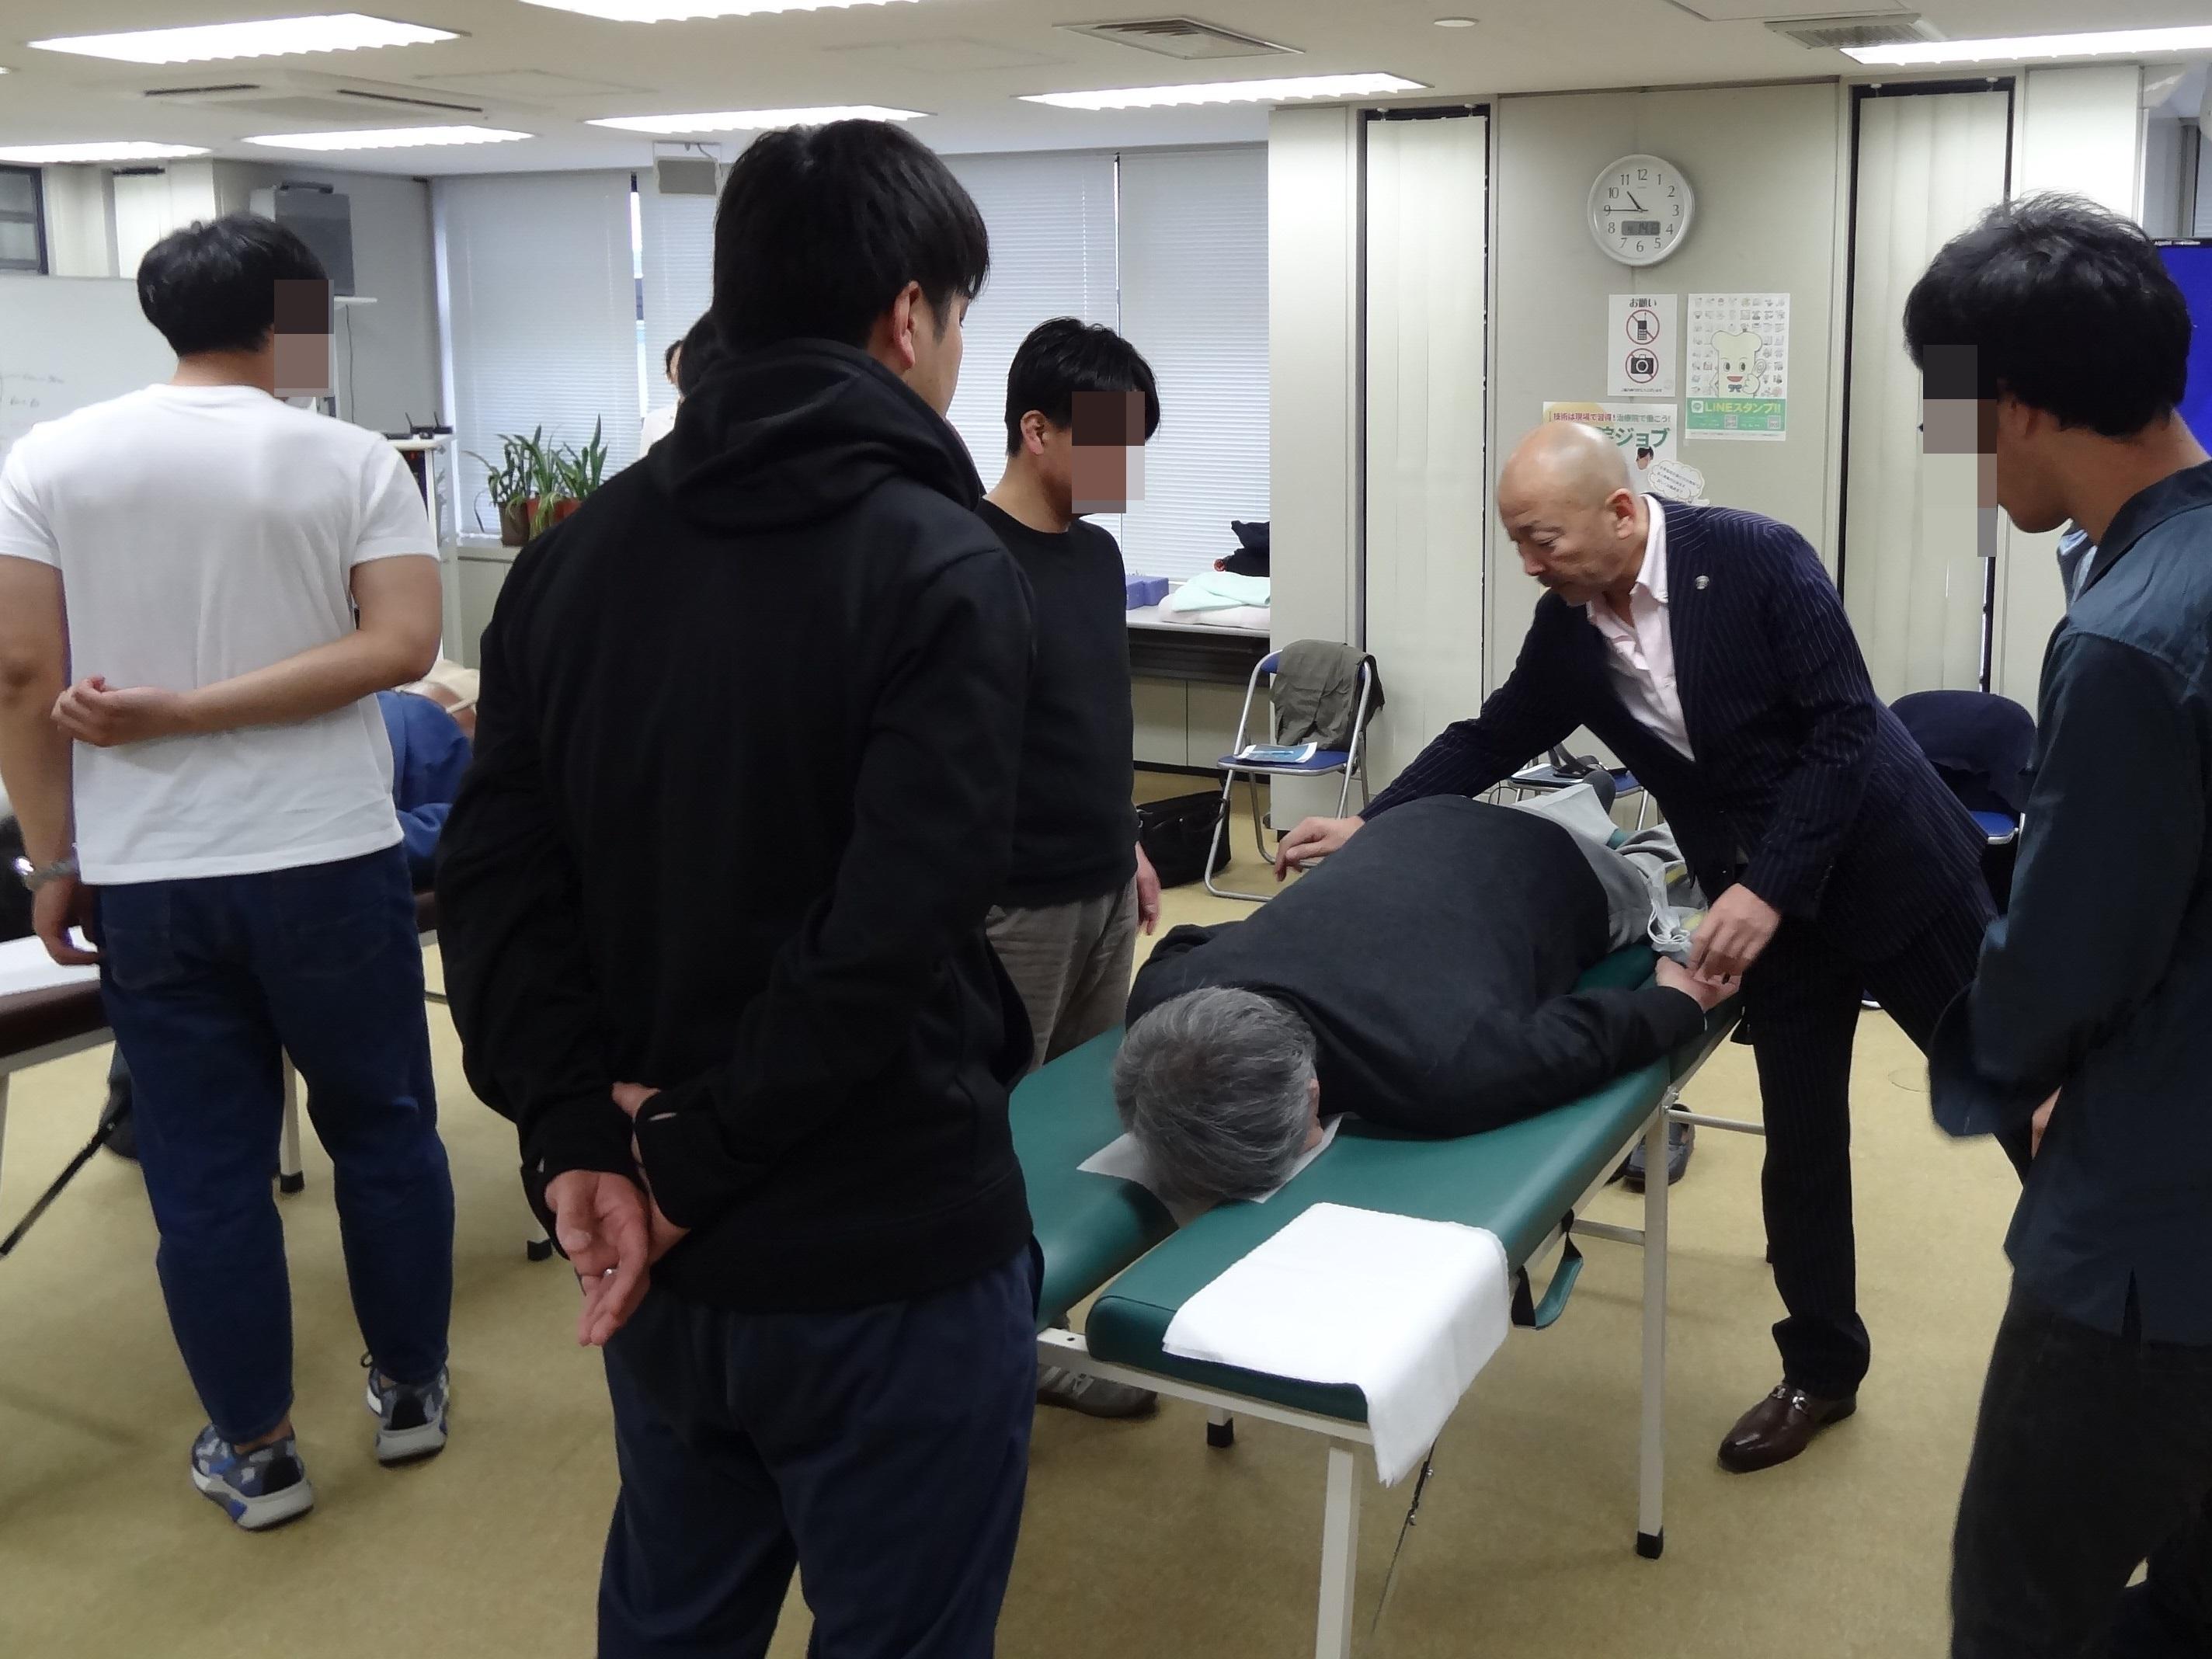 H31.4.14『H.M.B.T(ハイブリッド・メソッド・ブロック・テクニック)腰部疾患、急性腰痛・神経症状』(大阪)